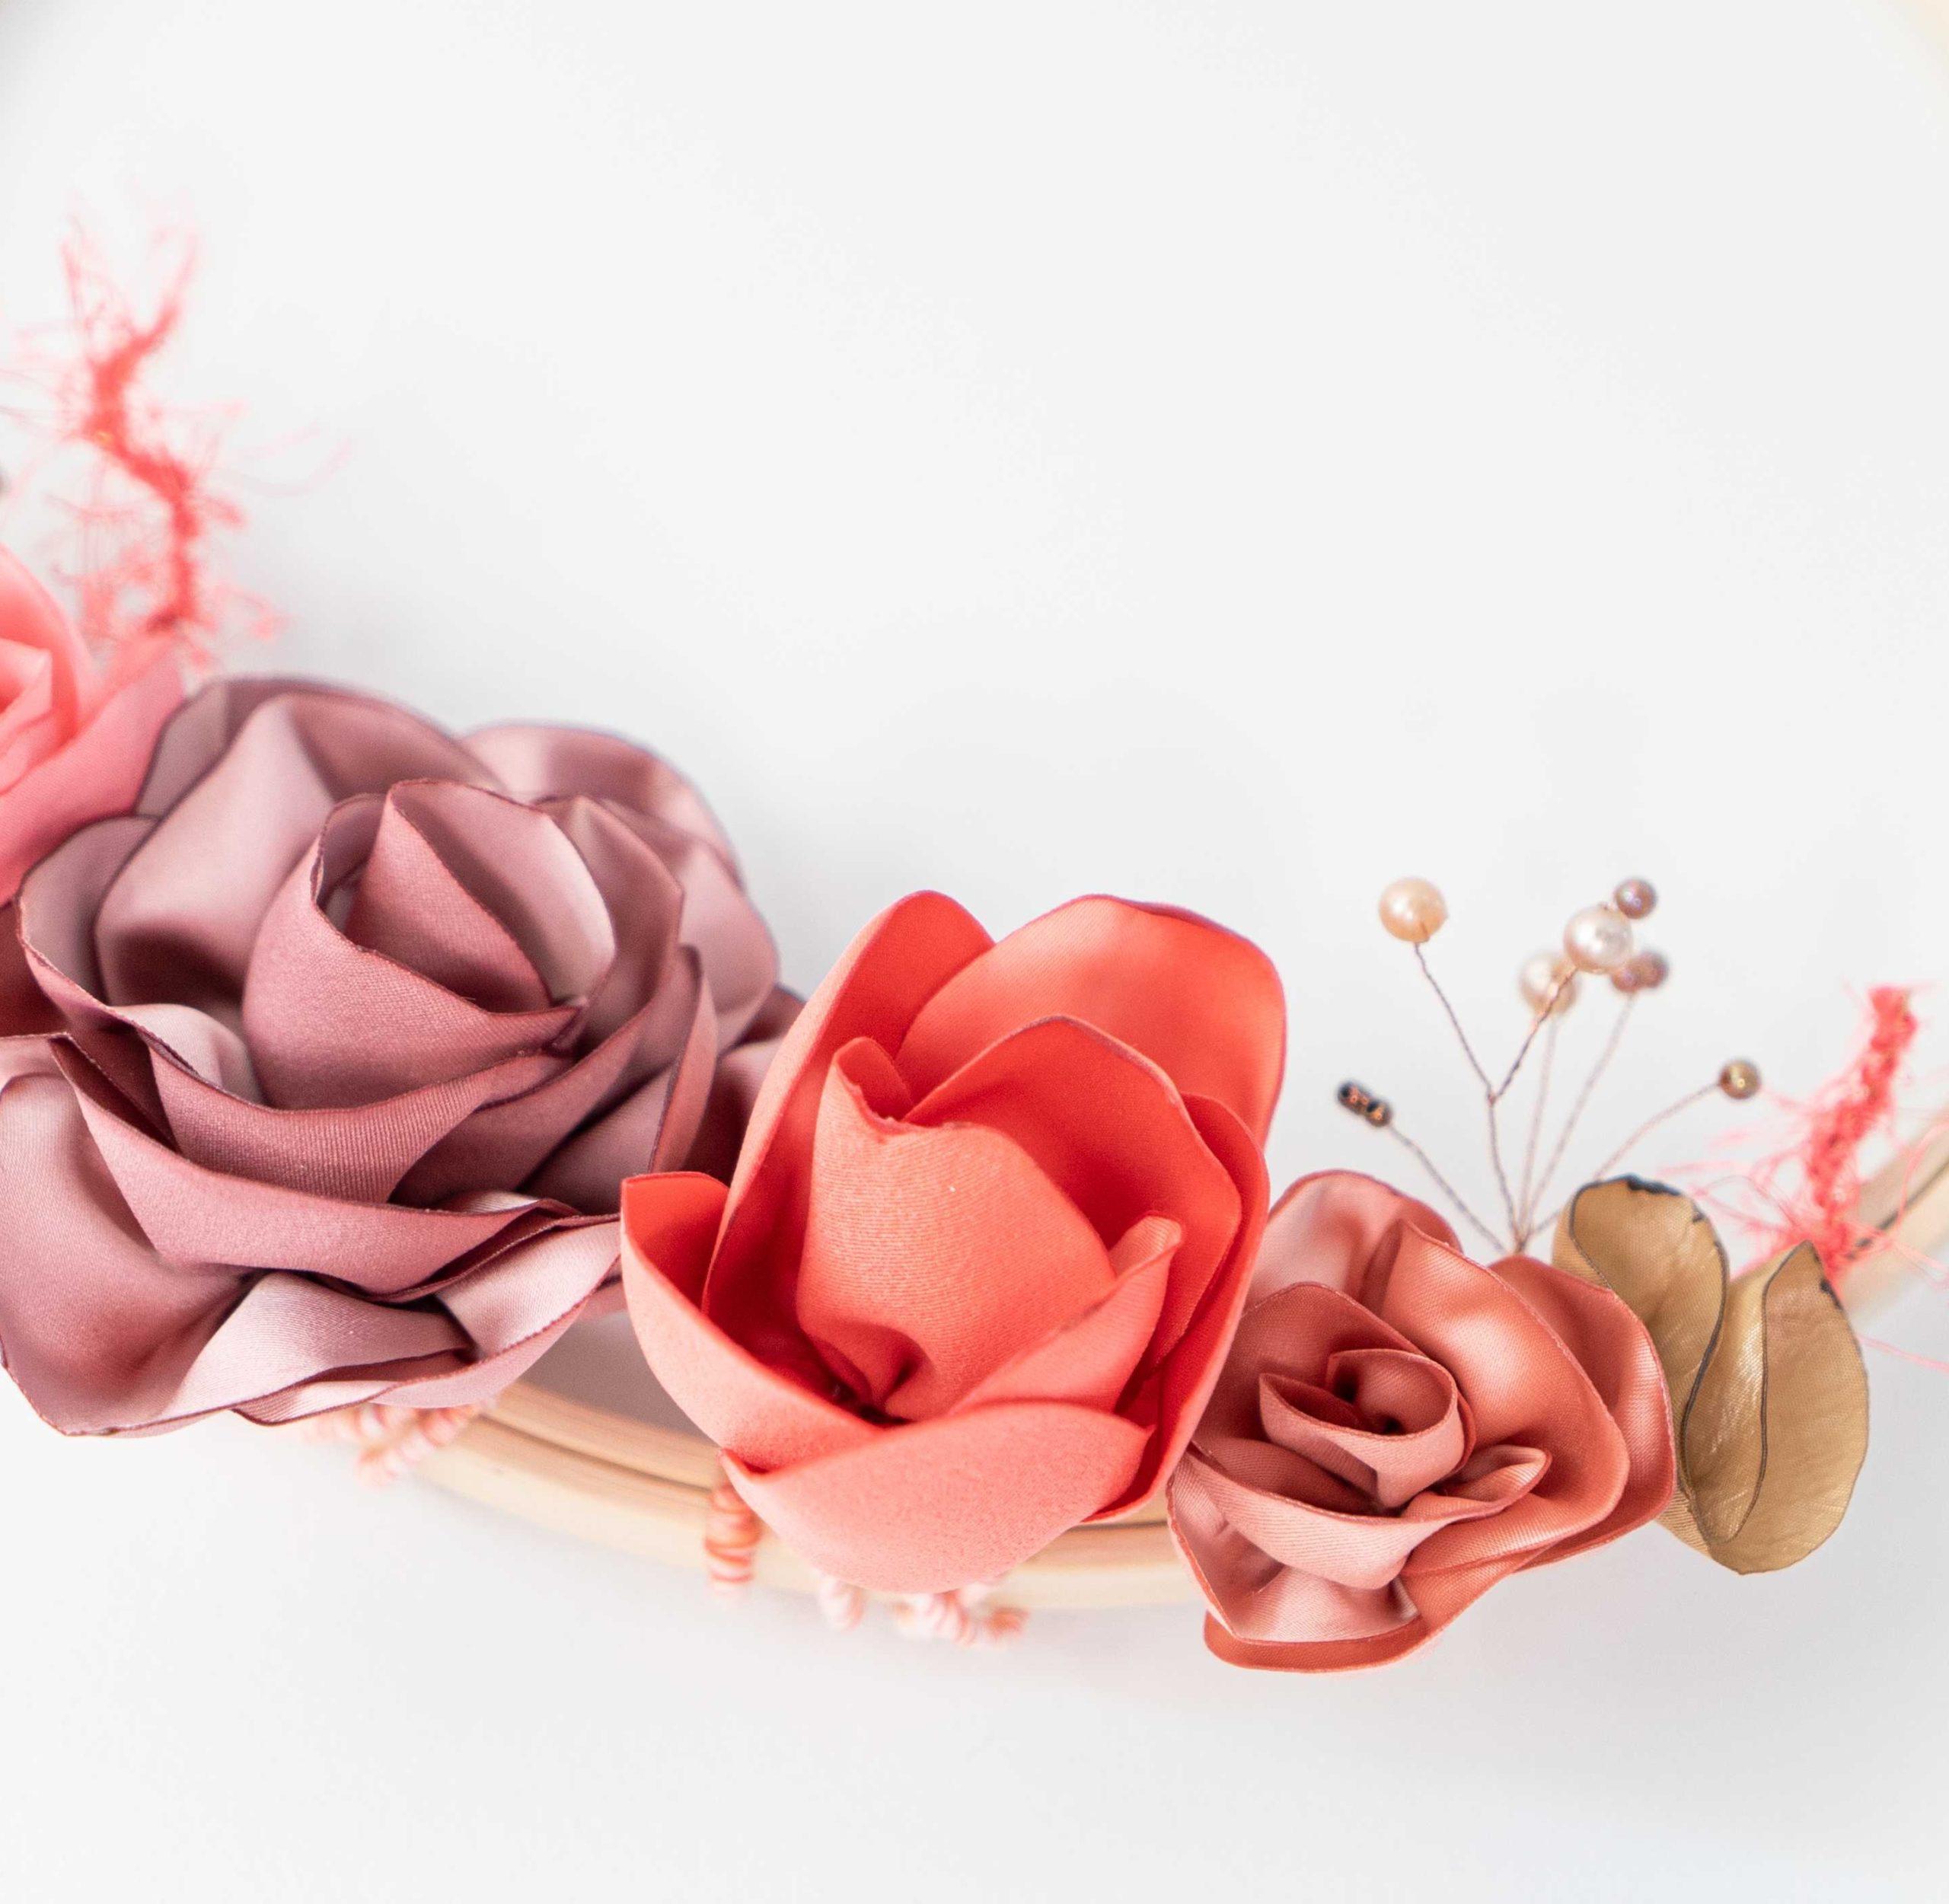 Cercle fleuri 2 Alice Marty - Couture florale Accessoires Mariage